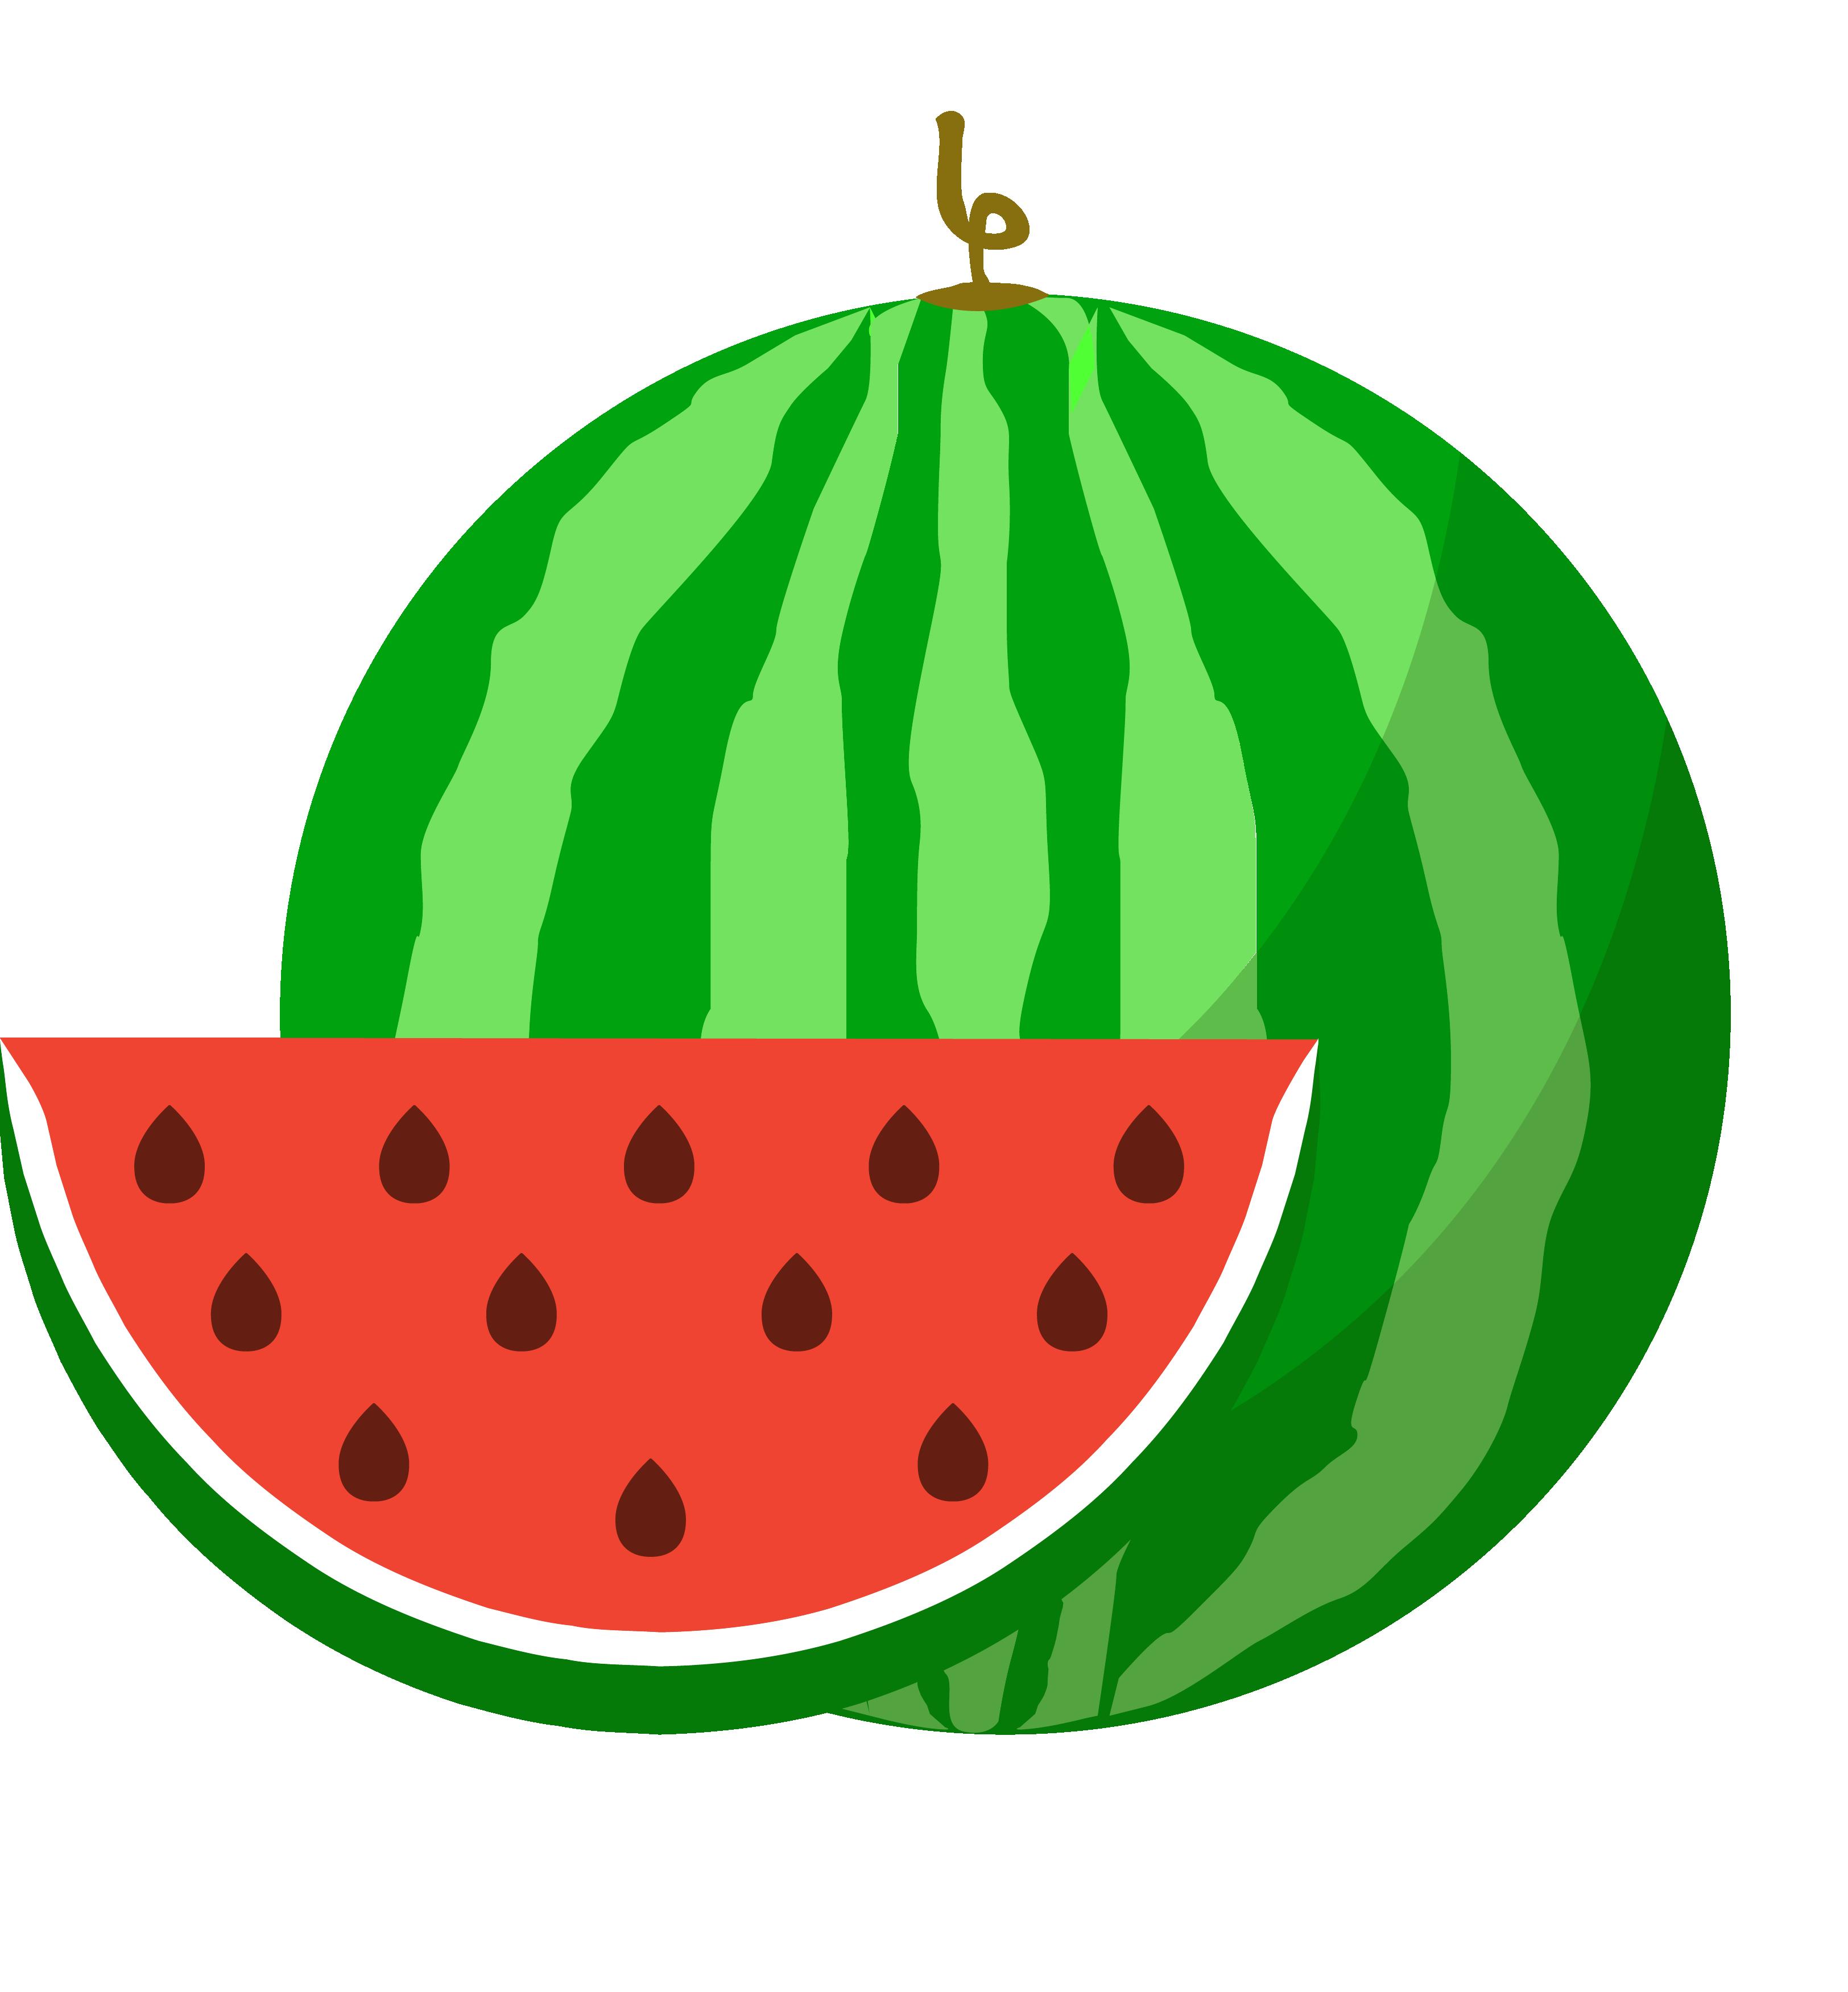 Watermelon cucumber melon